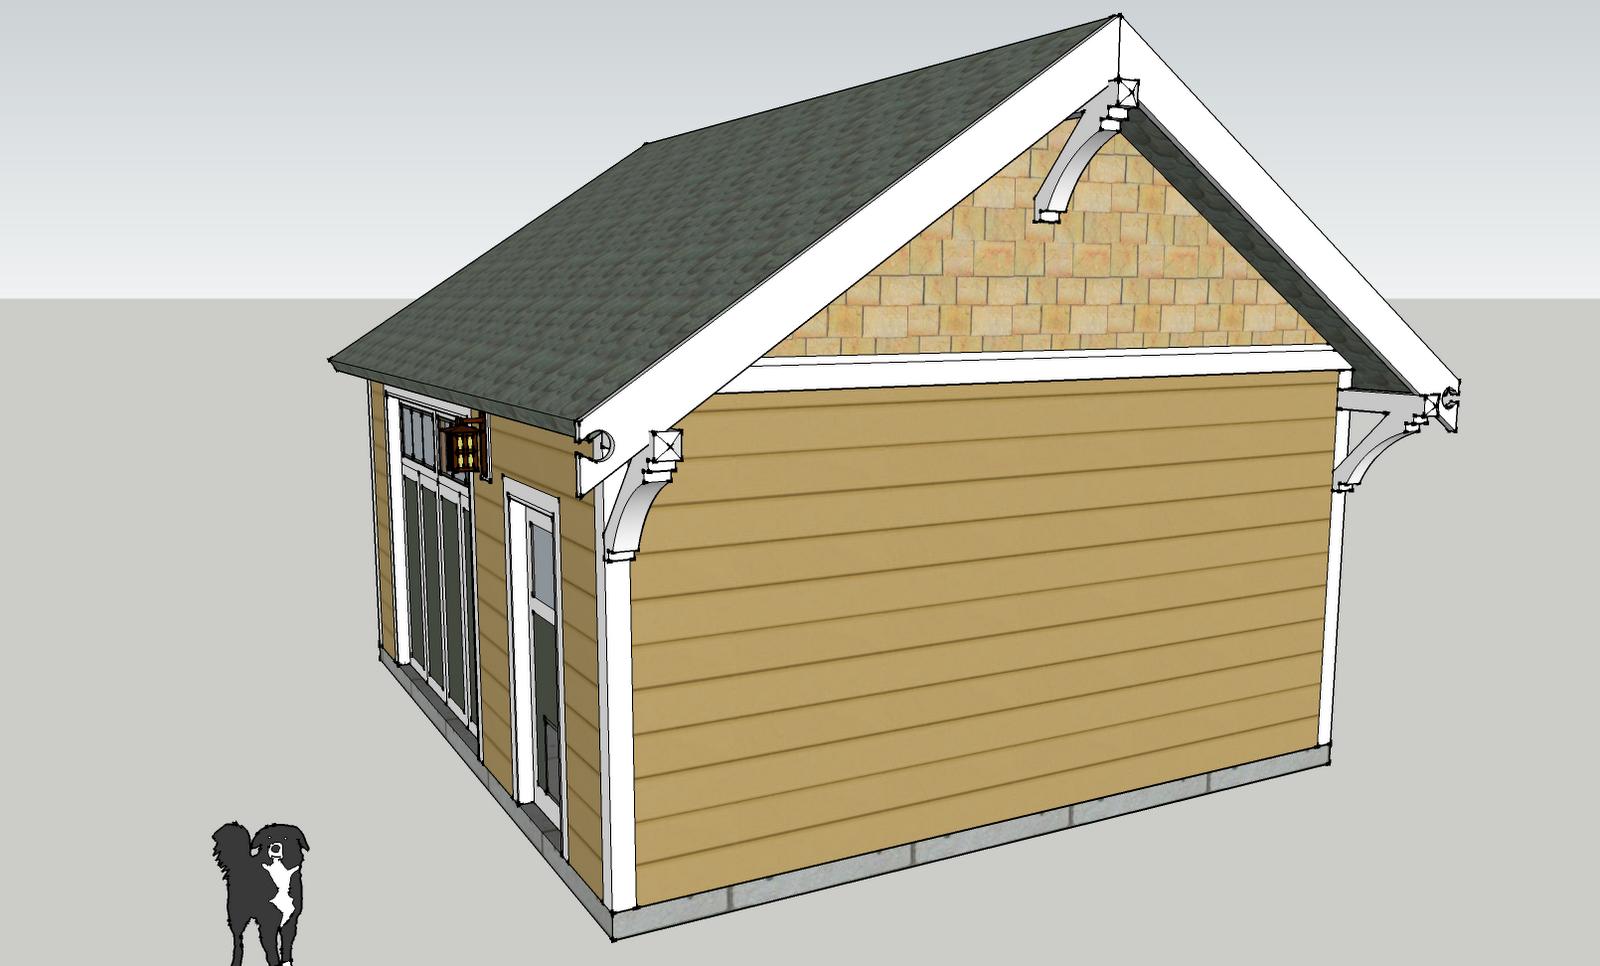 Laurelhurst craftsman bungalow pondering garage solution for Garage gable